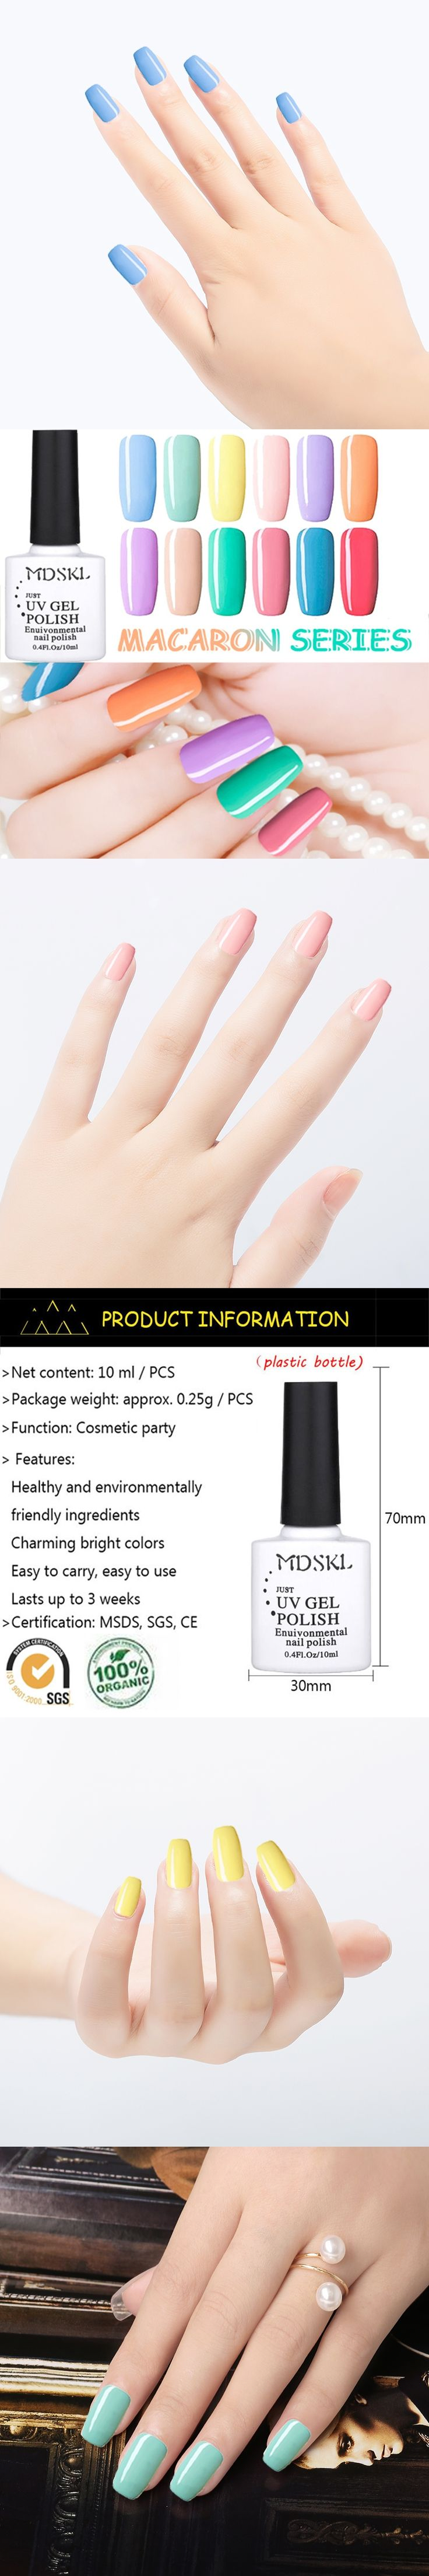 MDSKL New Fashion UV Gel Nail Polish from 12Macaron Colors Varnish Lacquer Gel Top Base Necessary Nail Art Paint 10ml